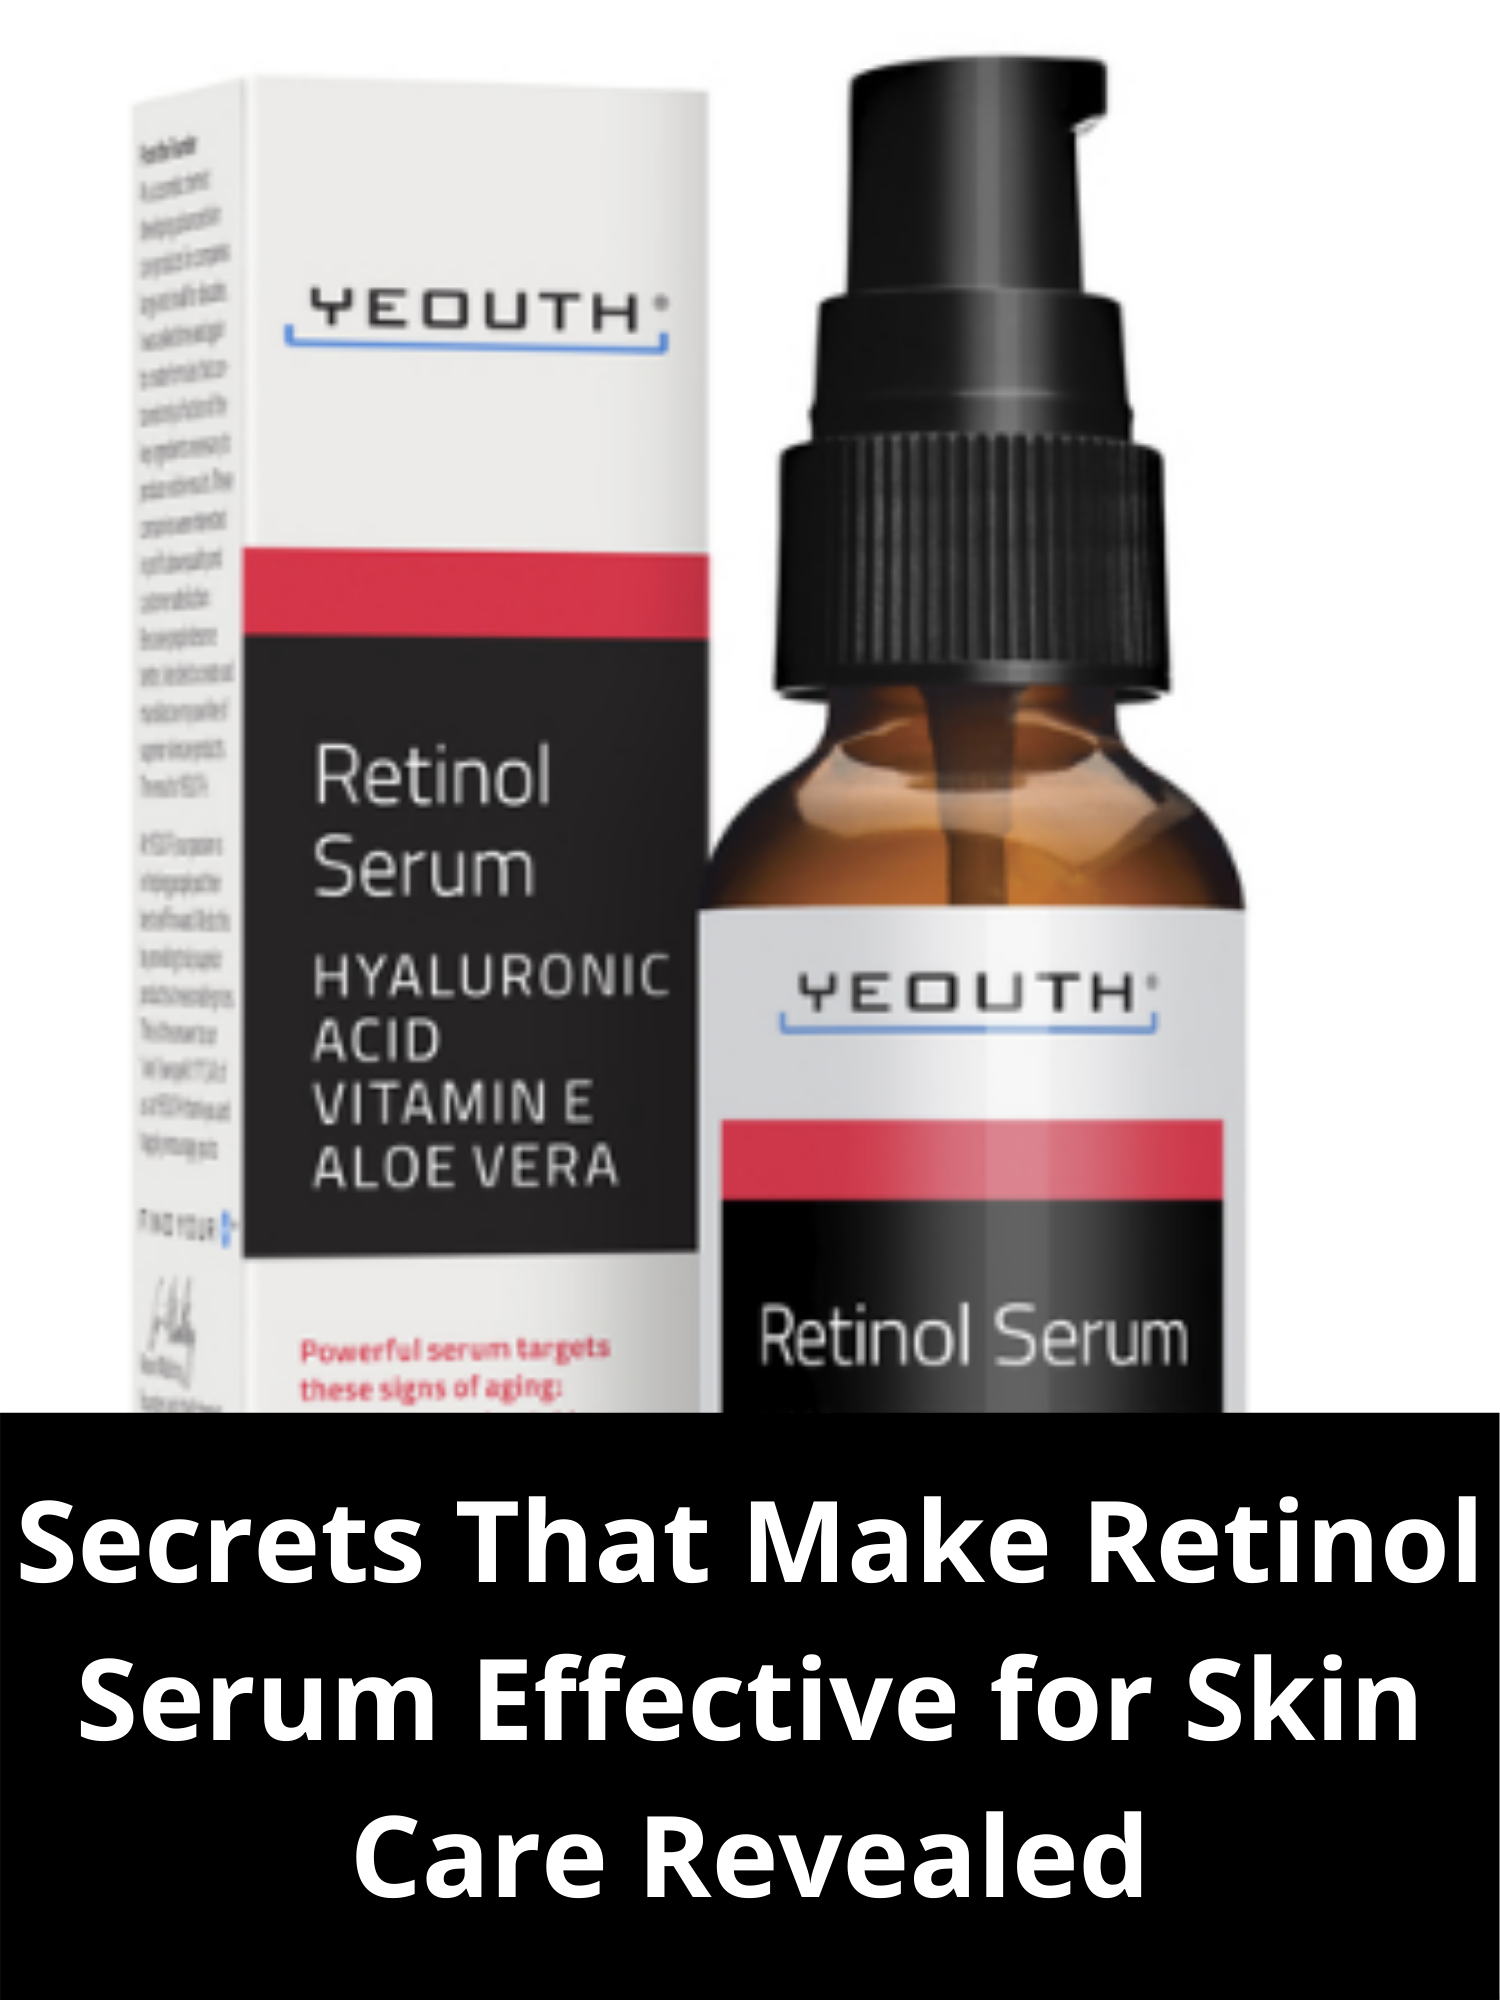 Secrets That Make Retinol Serum Effective For Skin Care Revealed In 2020 Retinol Serum Retinol Serum